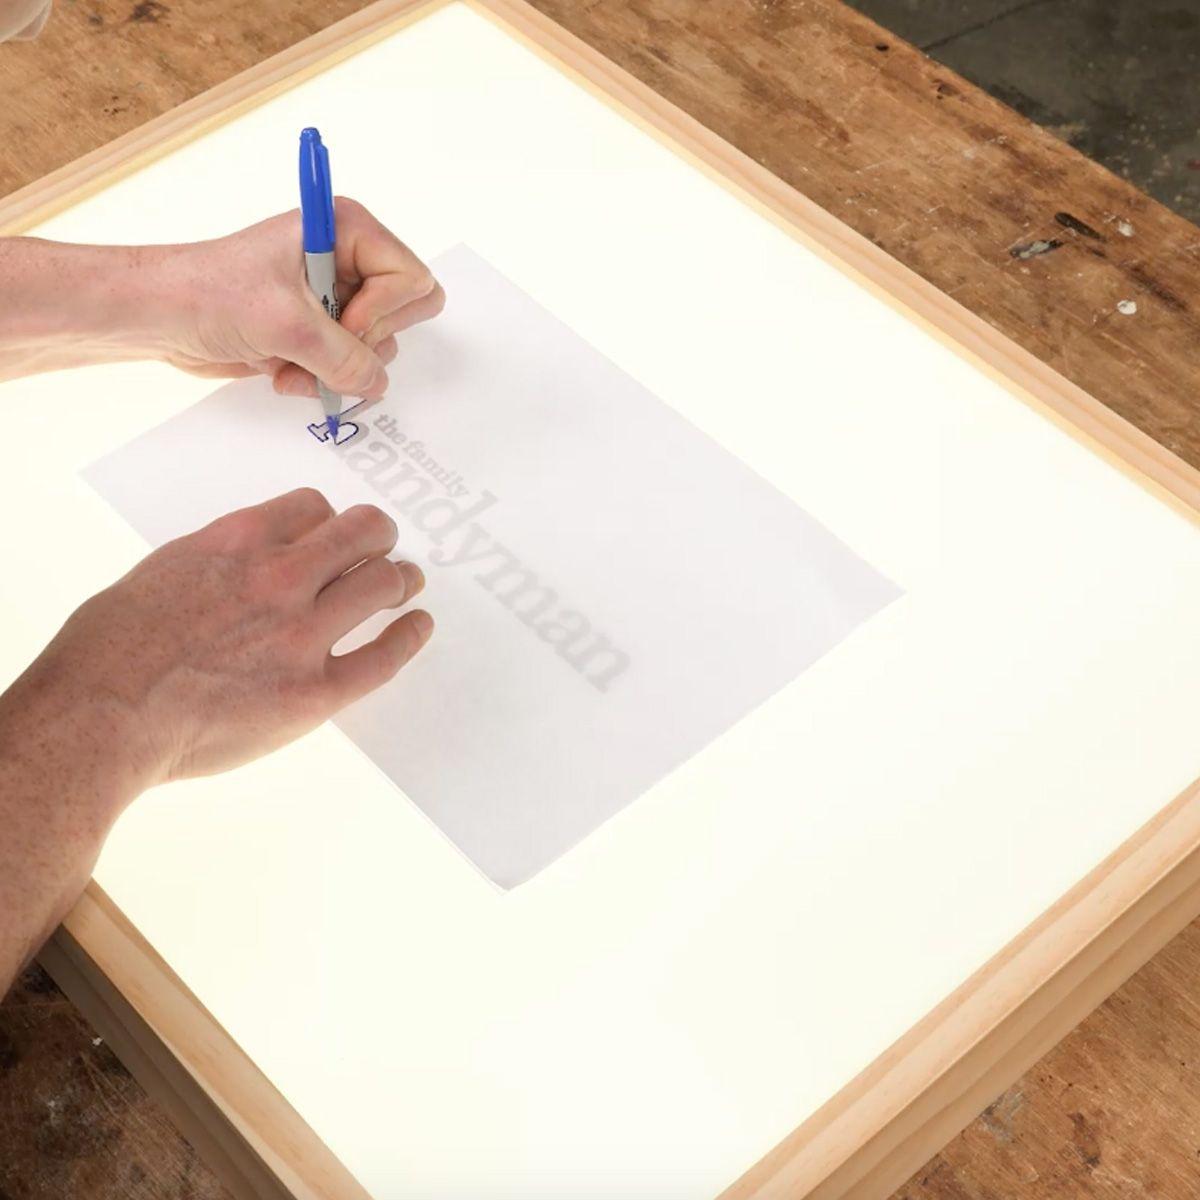 How To Build A Quick Diy Light Box Light Box Diy Diy Light Table Light Box For Tracing